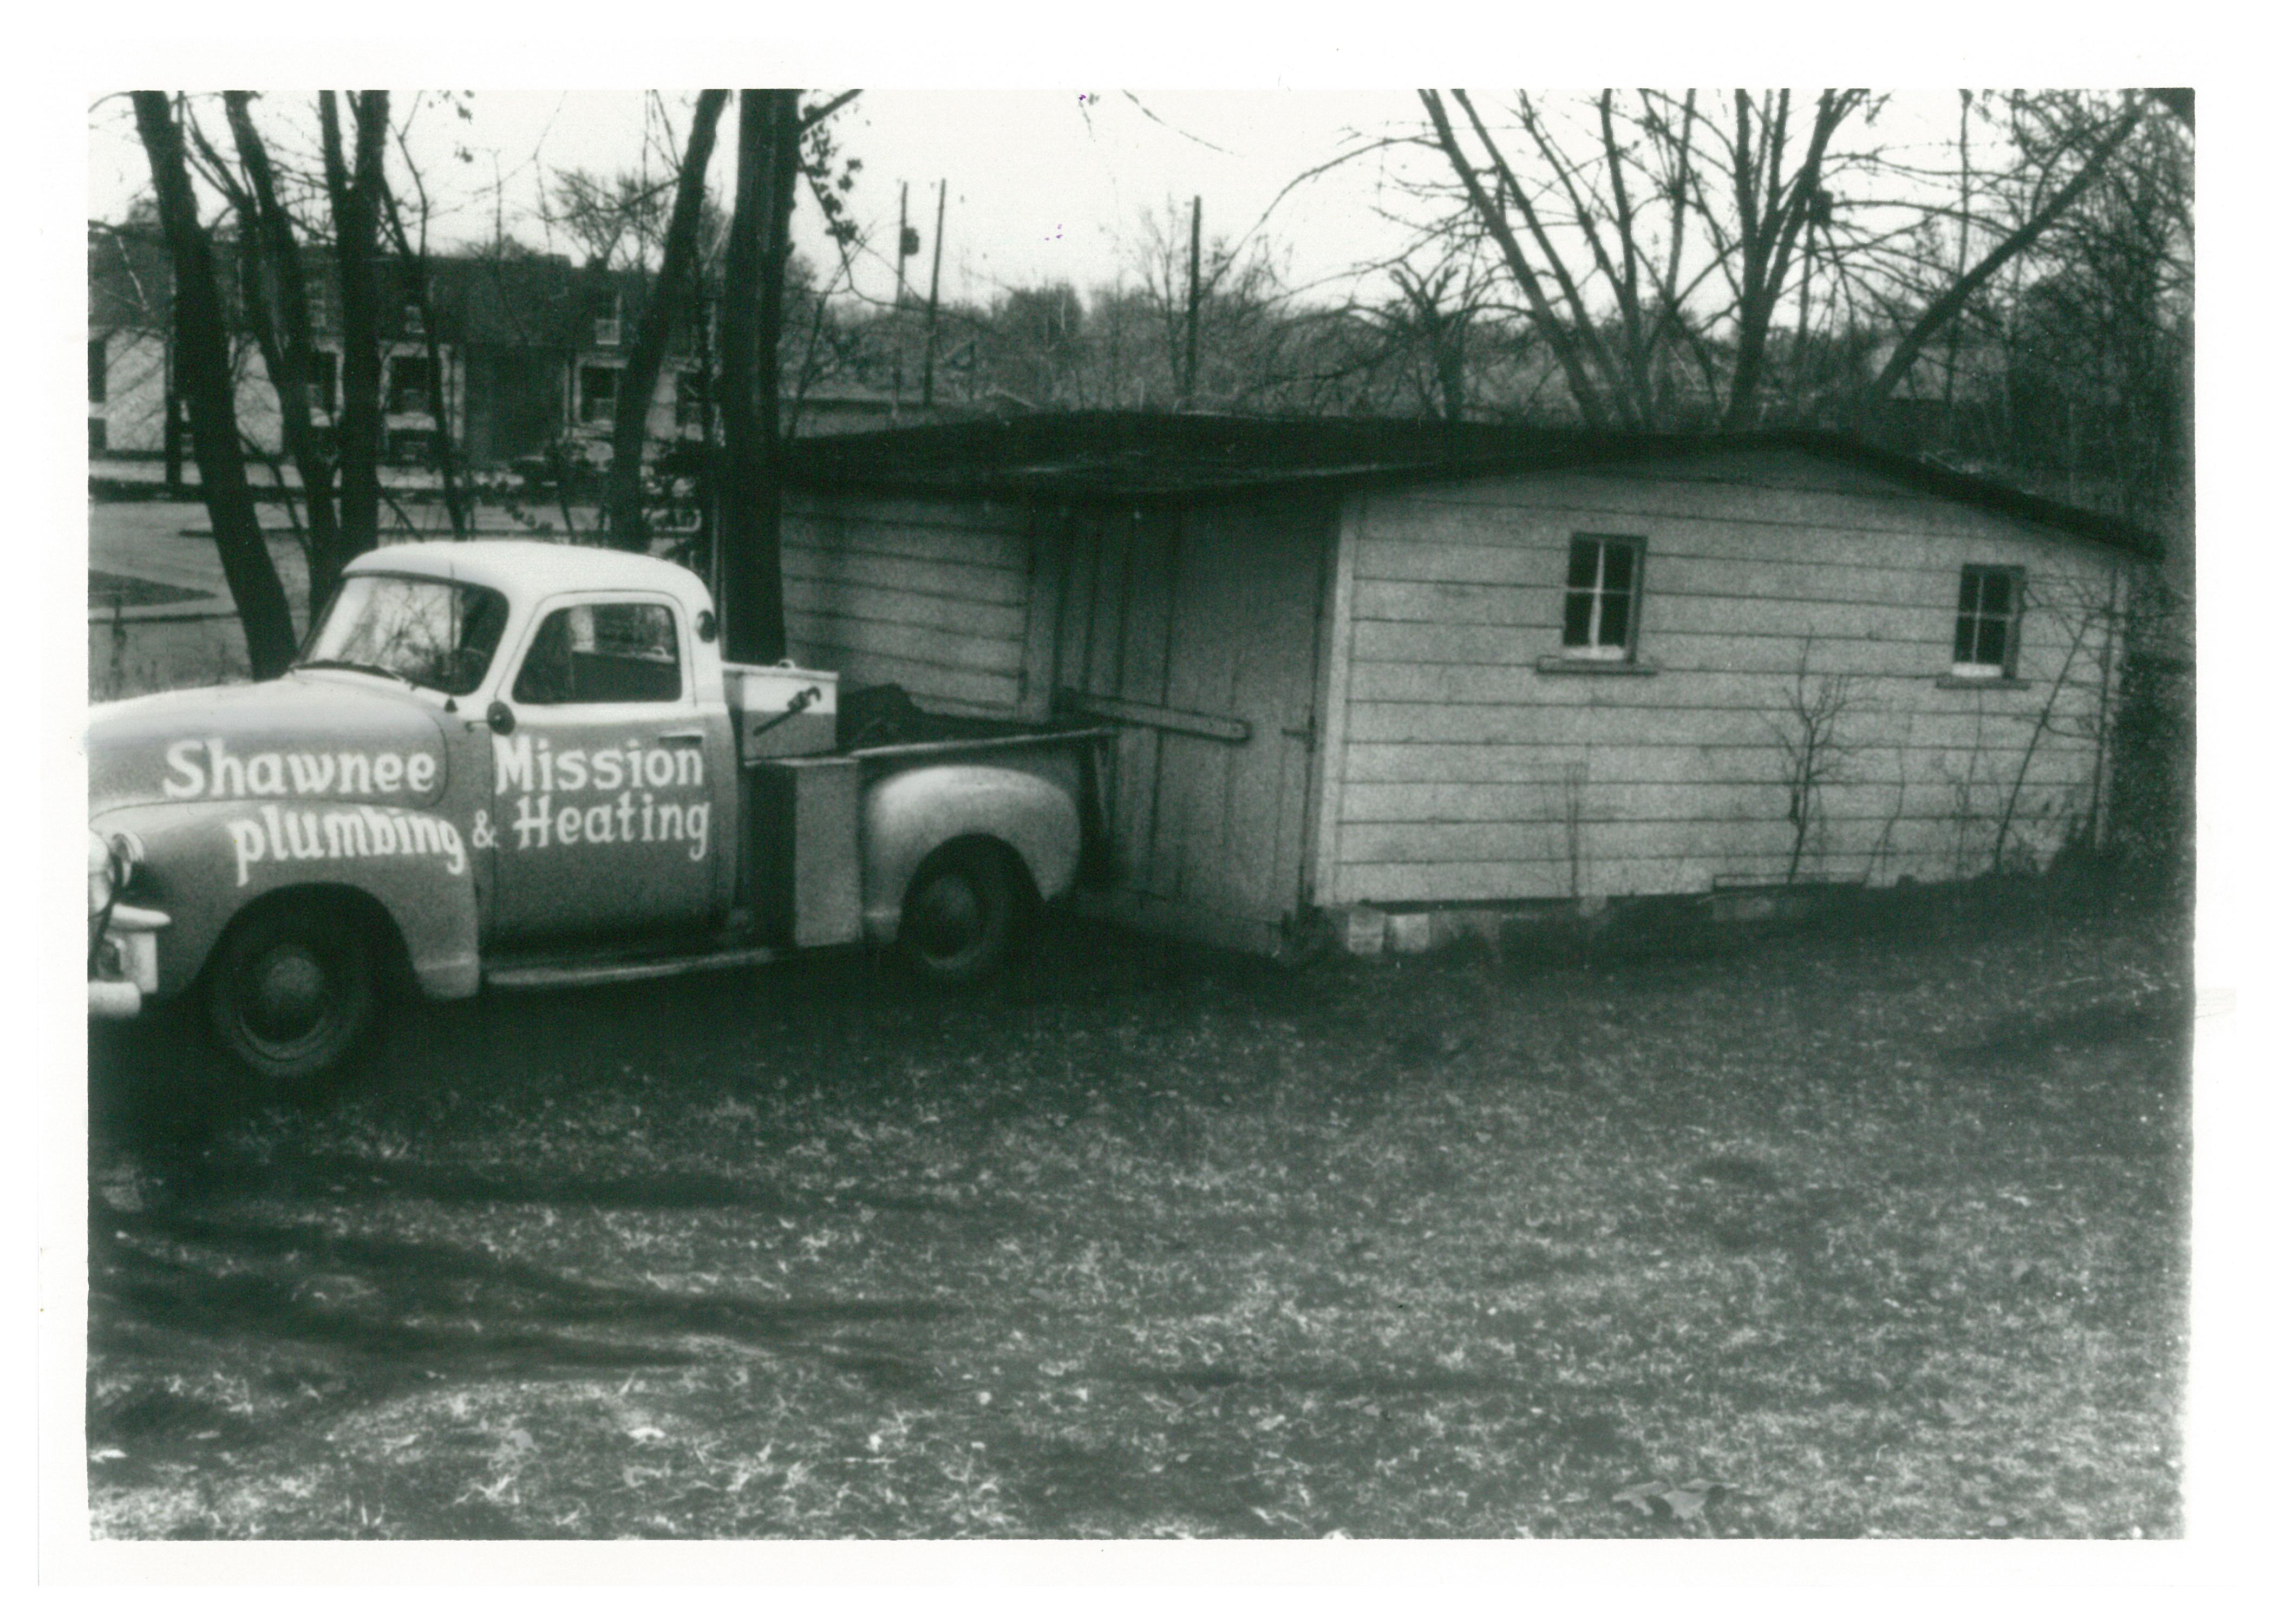 Plumbers Hvac In Kansas City Leawood Overland Park Prairie Village